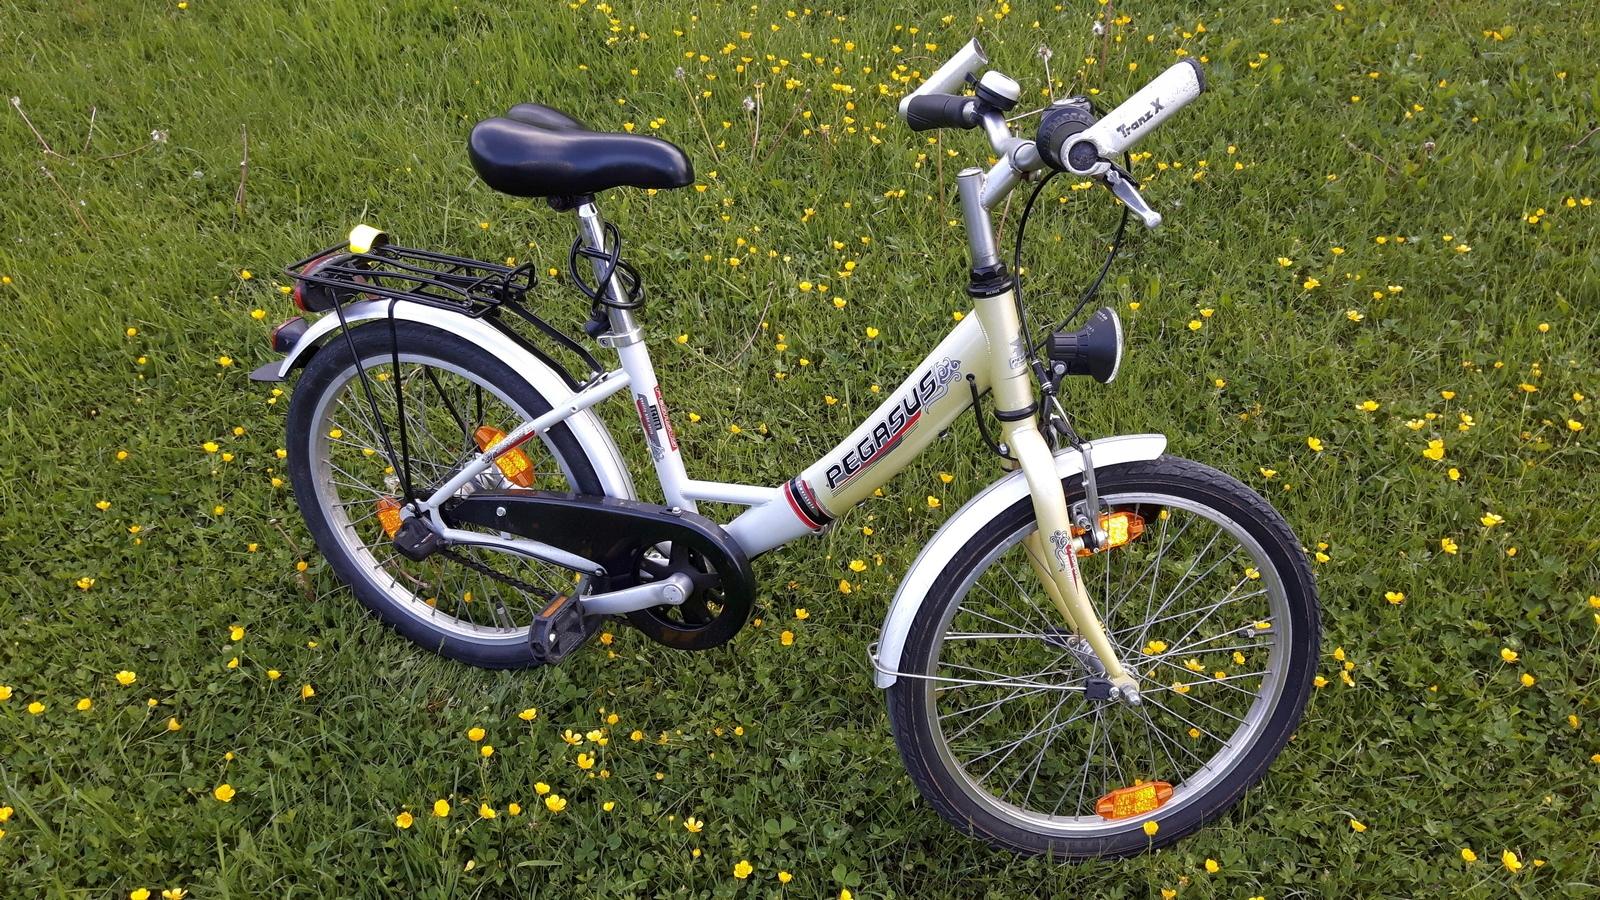 Rower Pegasus niemiecki z Shimano, nie chińczyk!